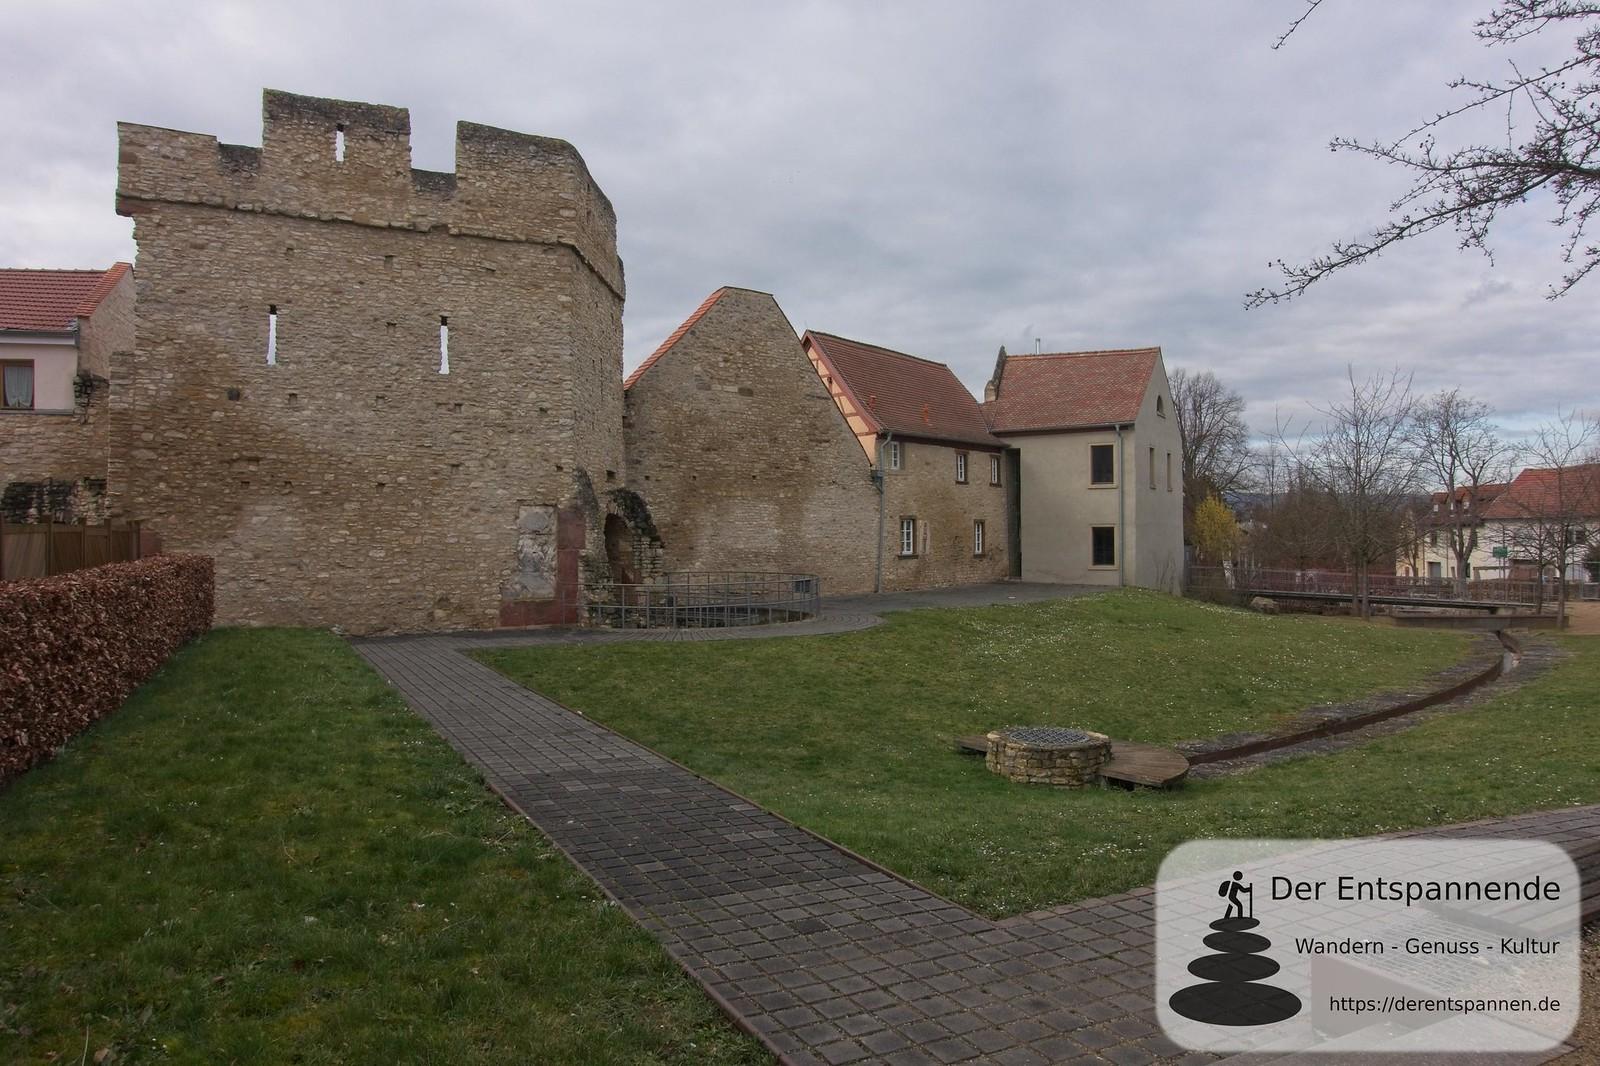 Heidesheimer Tor (Kaiserpfalz Ingelheim)